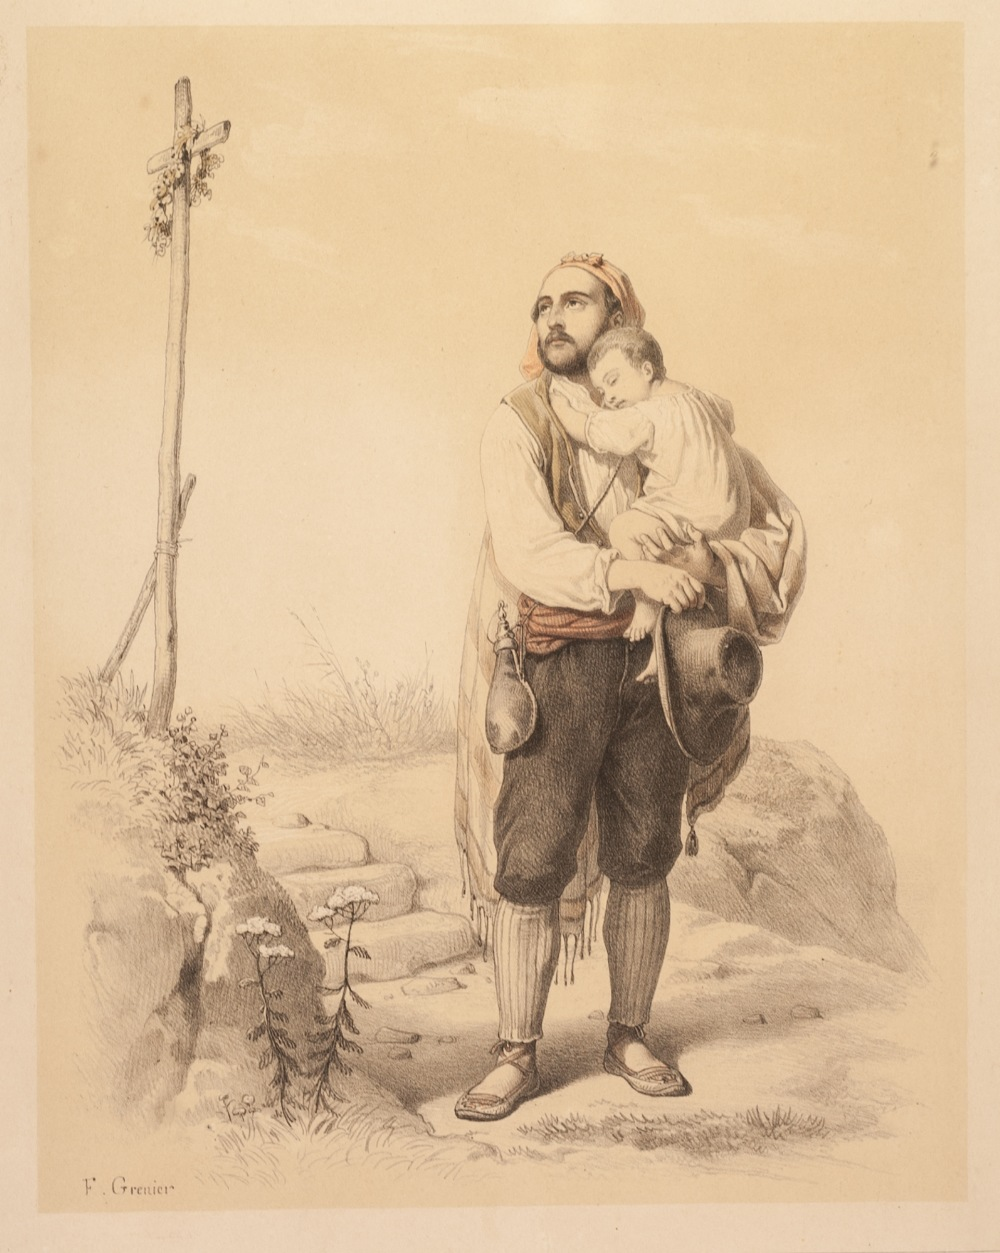 "Lot 209 - F. GRENIER SET OF FIVE TINTED BOOKPLATE PRINTS Rural figure studies, numbered 10"" x 8"" (25.4cm x"